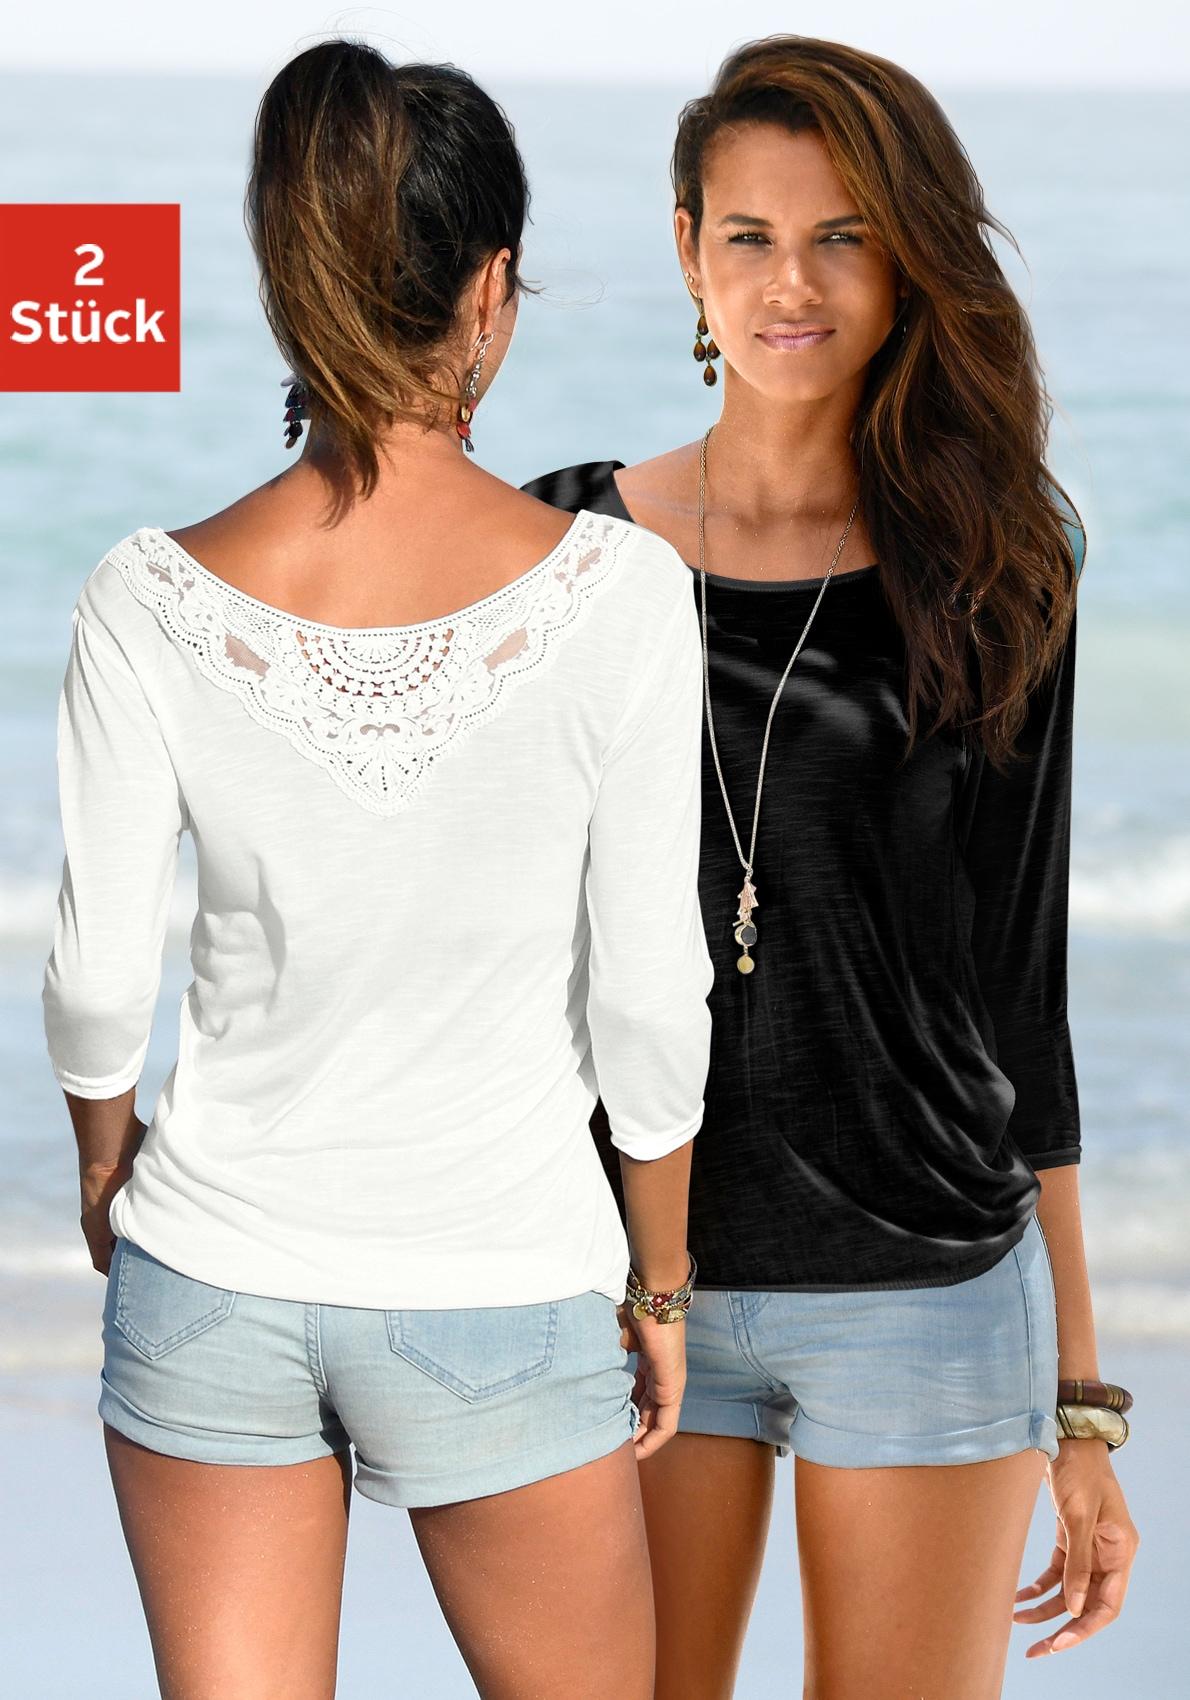 Image of Beachtime 3/4-Arm-Shirt, mit tollem Spitzendetail am Rücken